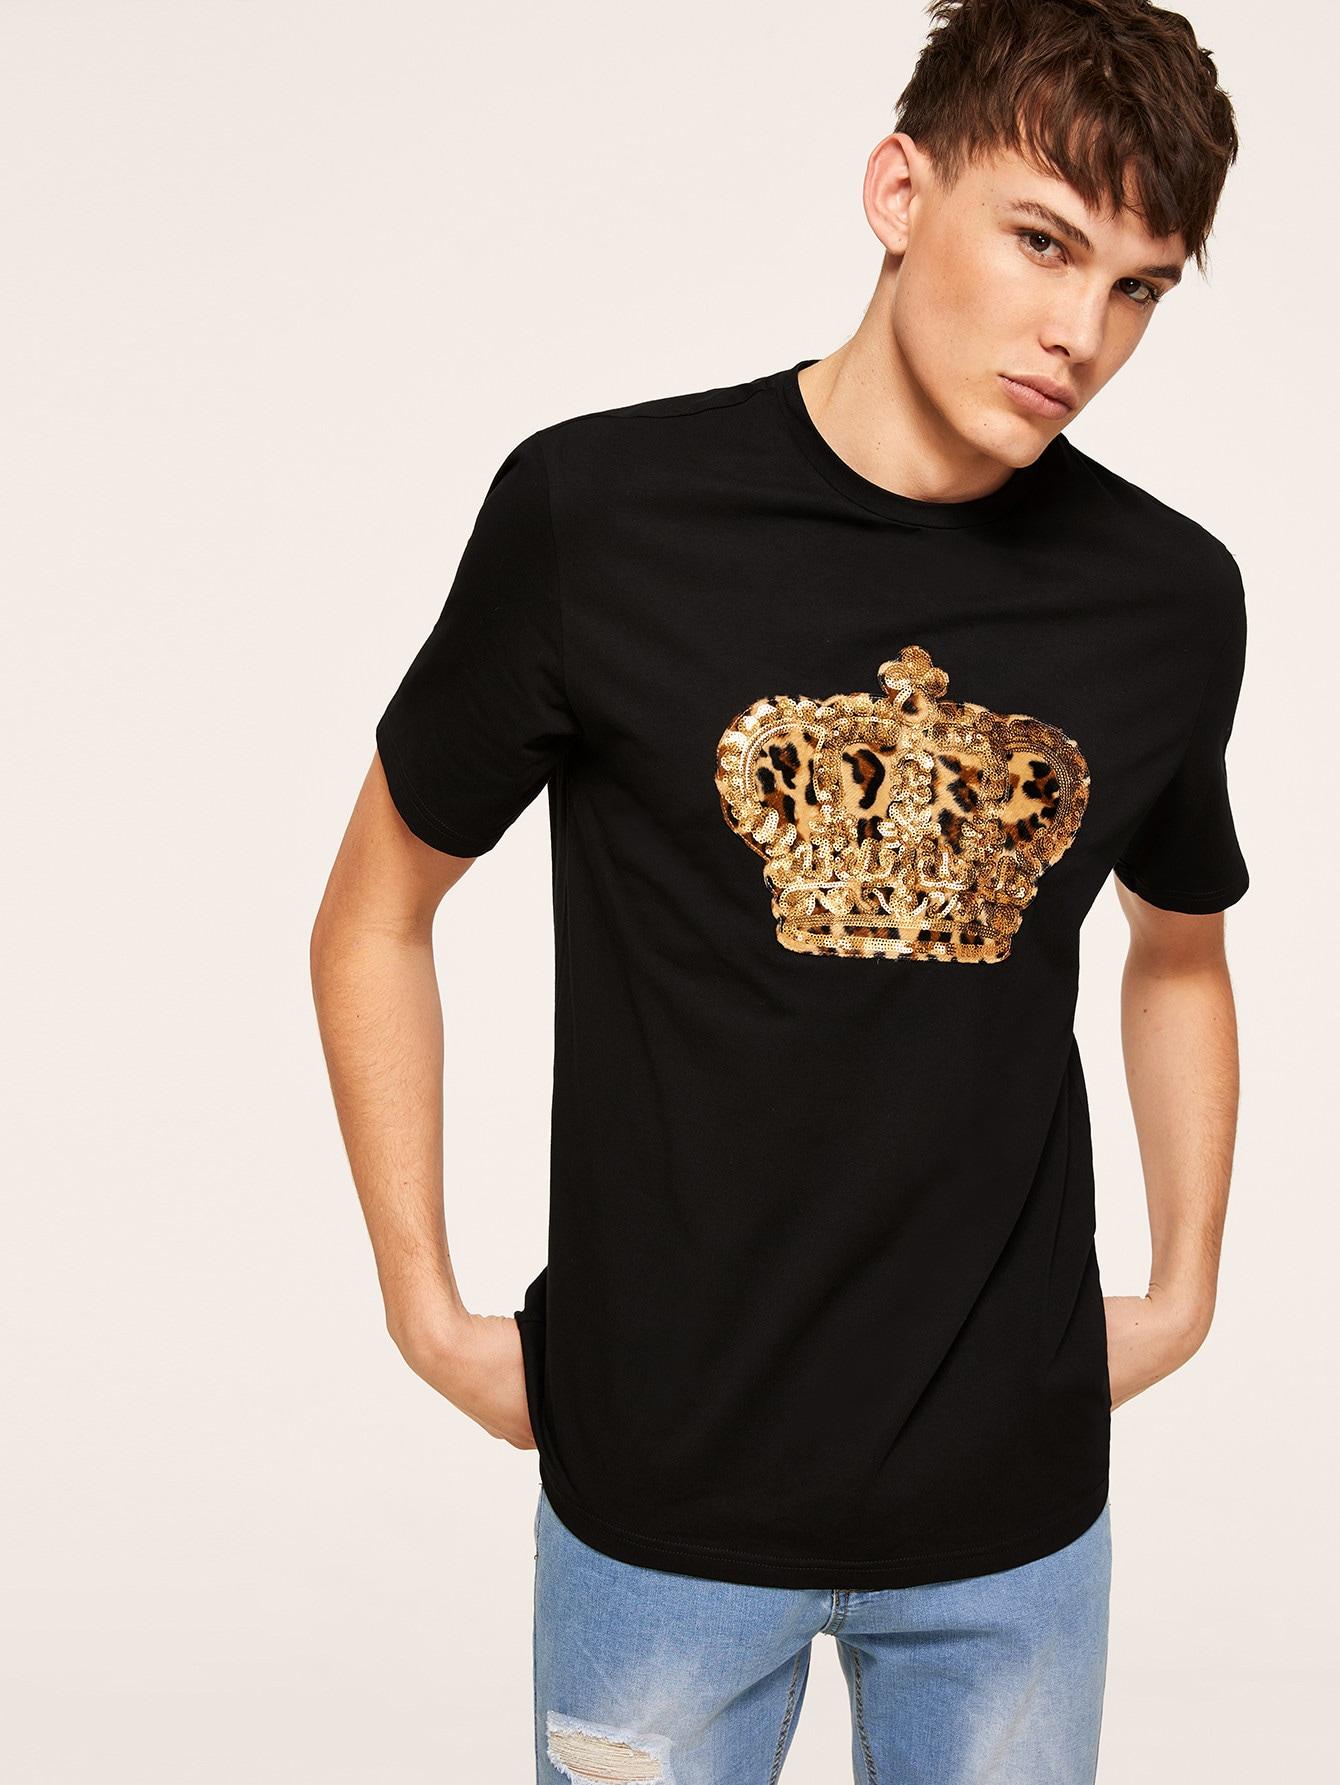 Фото - Мужская леопардовая футболка с блестками от SheIn черного цвета